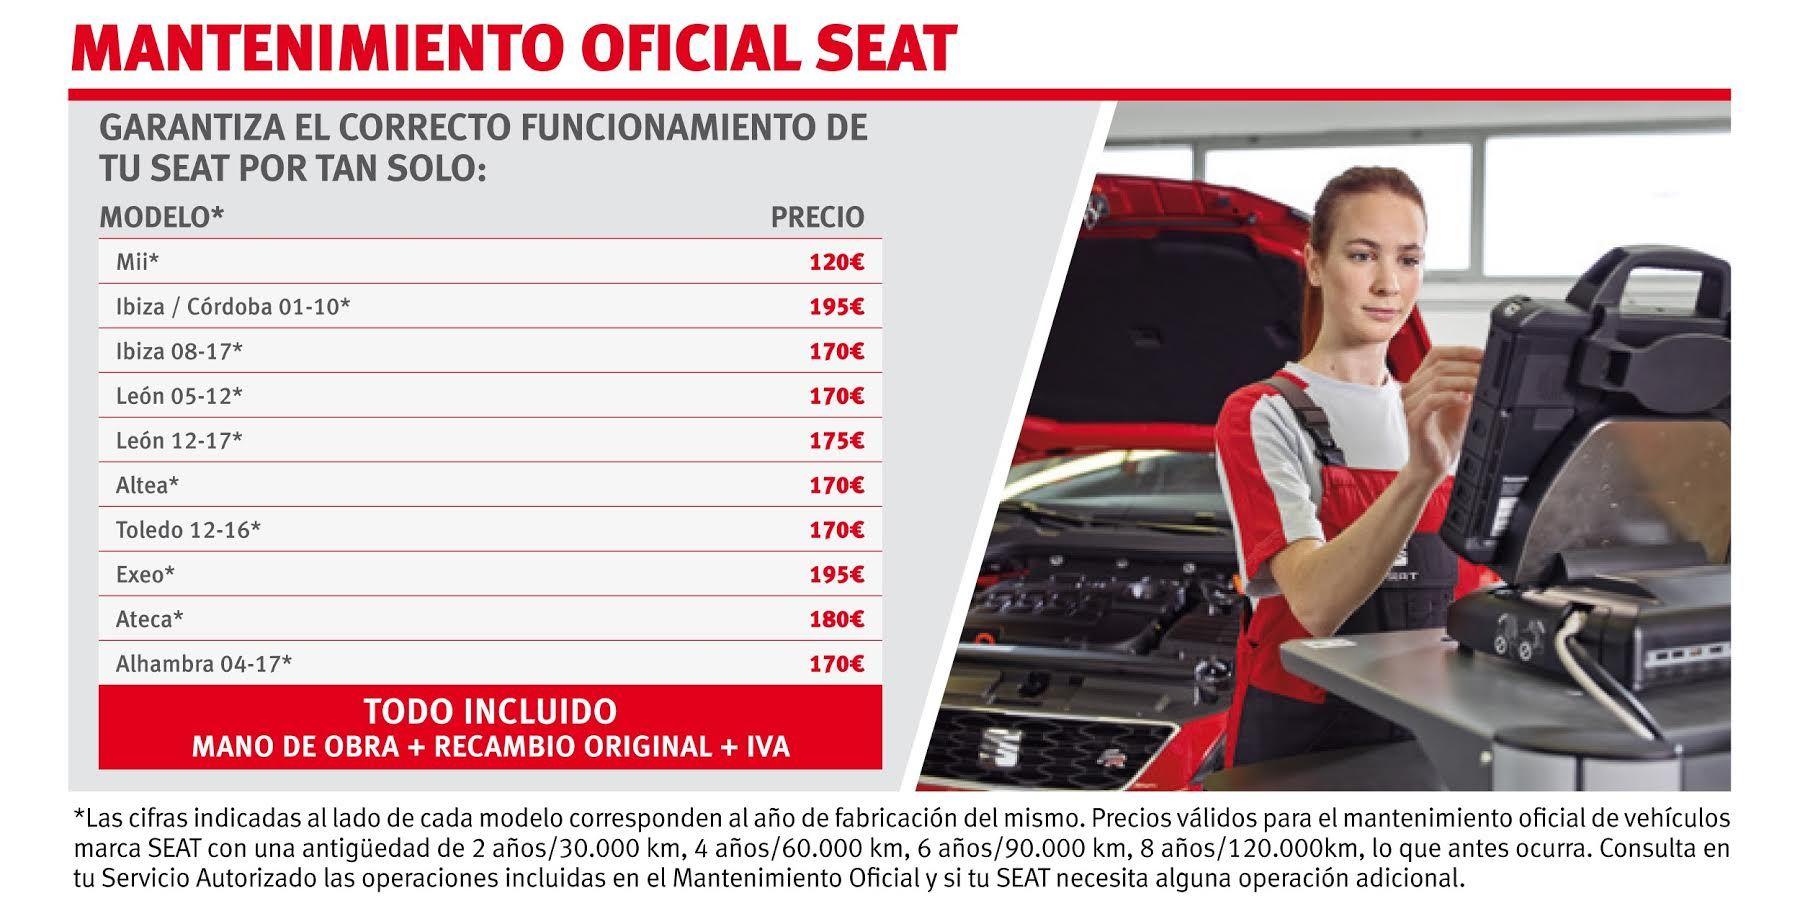 MANTENIMIENTO OFICIAL SEAT. 2017